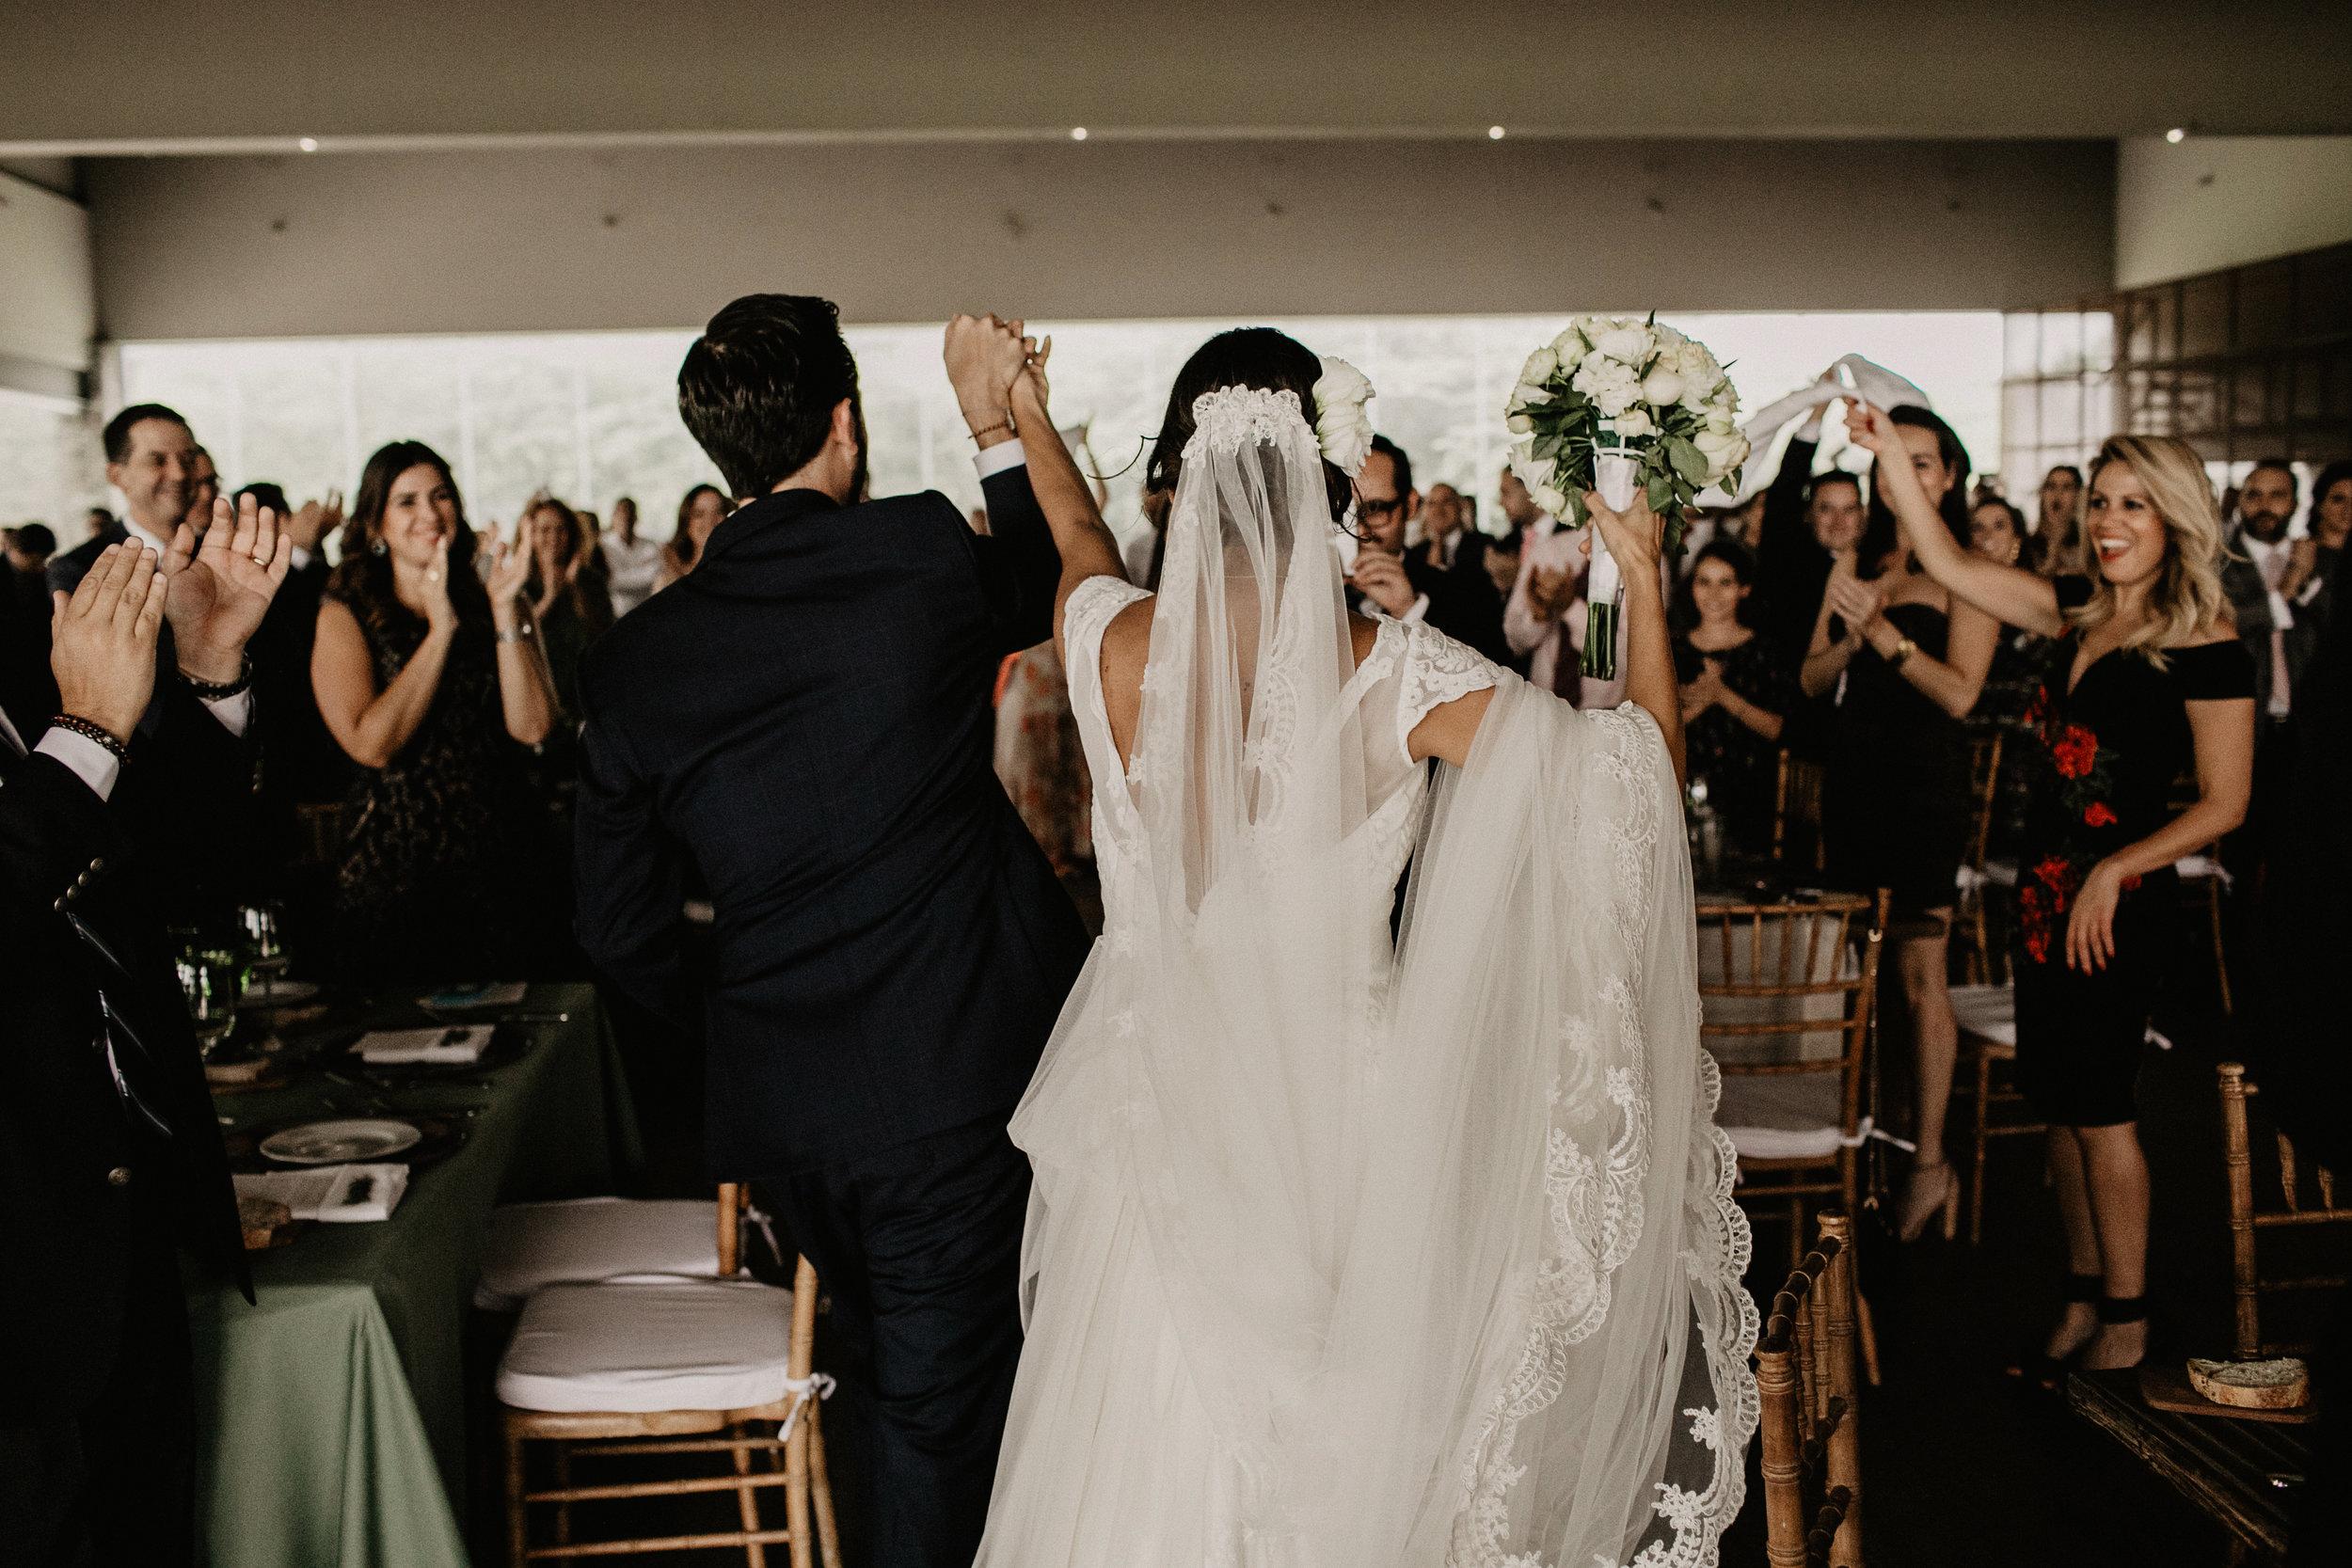 alfonso_flores_destination_wedding_photographer_pau_alonso_792.JPG